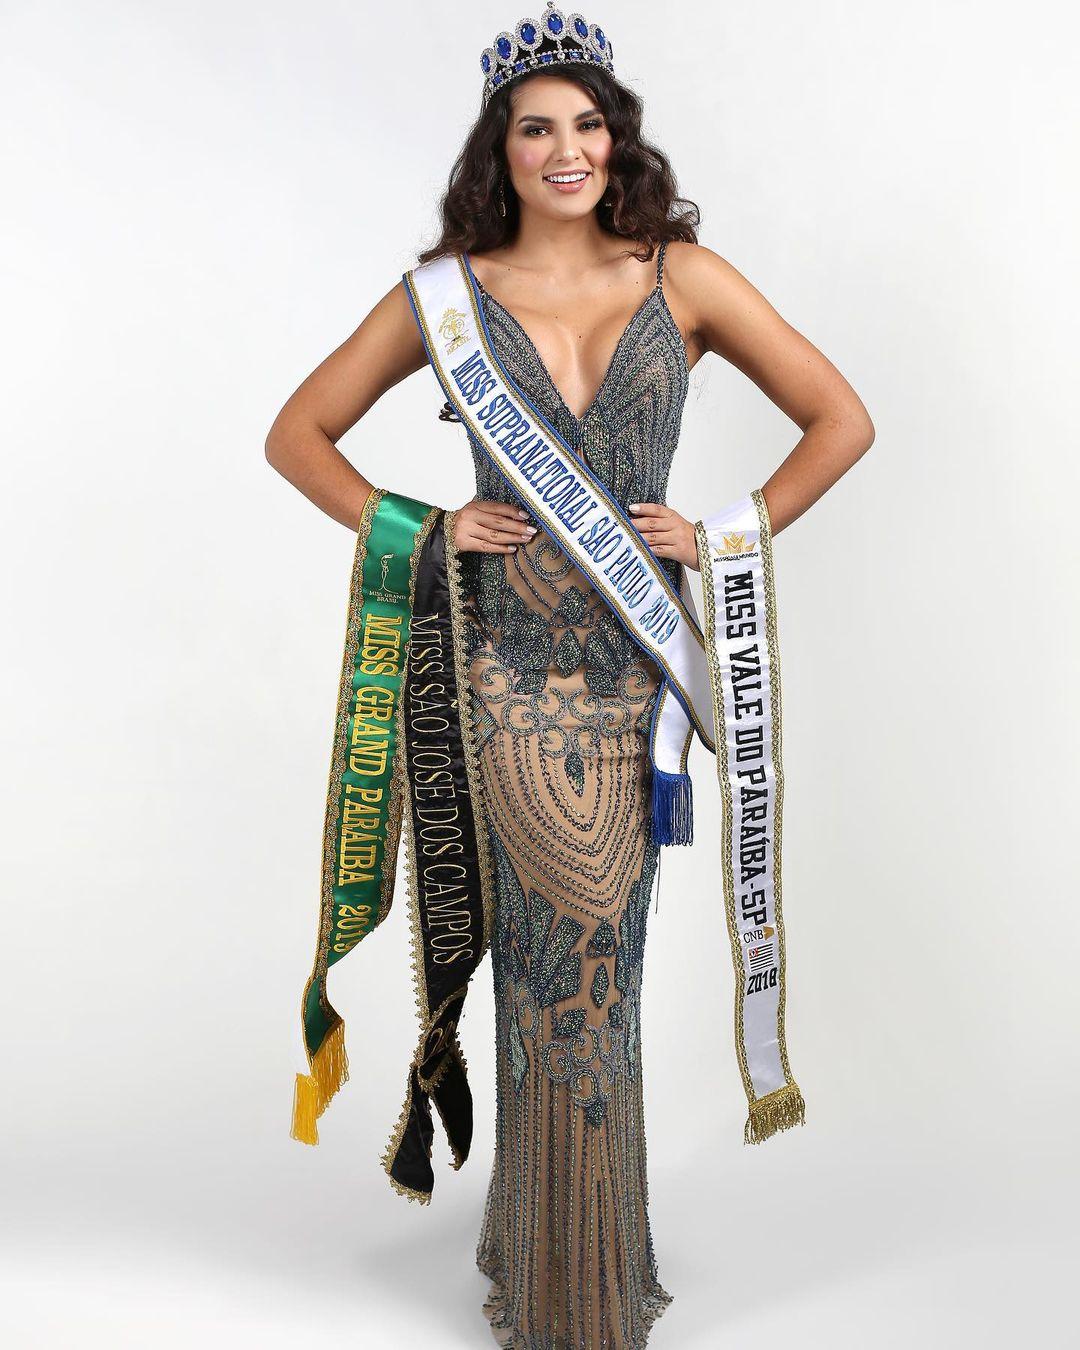 jessica caroline costa, nlatinoamericana universal 2021/top 5 de miss supranational brazil 2020/miss grand paraiba 2019/miss vale do paraiba mundo 2018. - Página 7 Jessic32